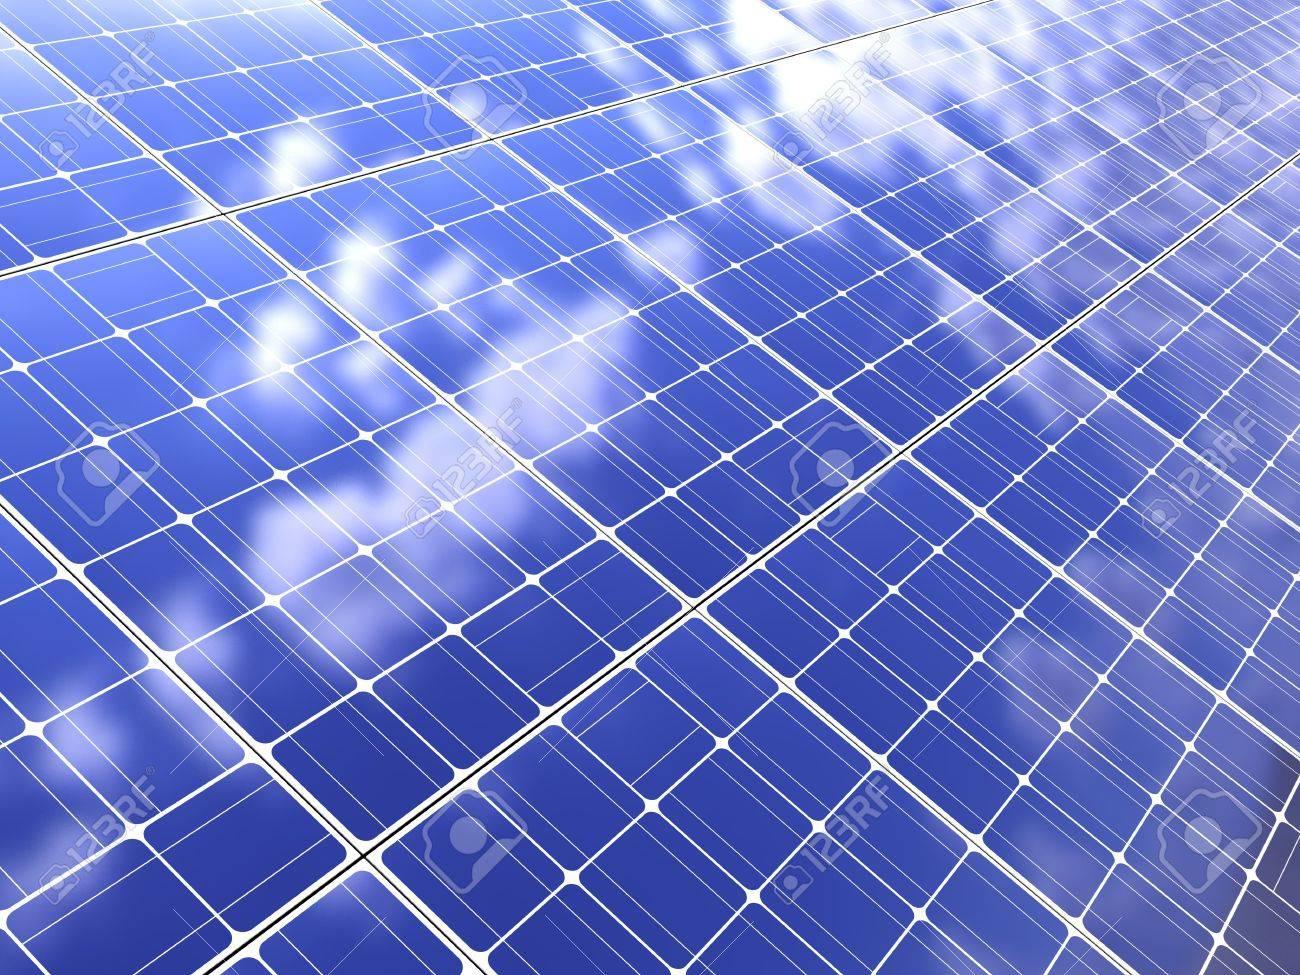 abstract 3d illustration of solar panel background Stock Illustration - 6895108